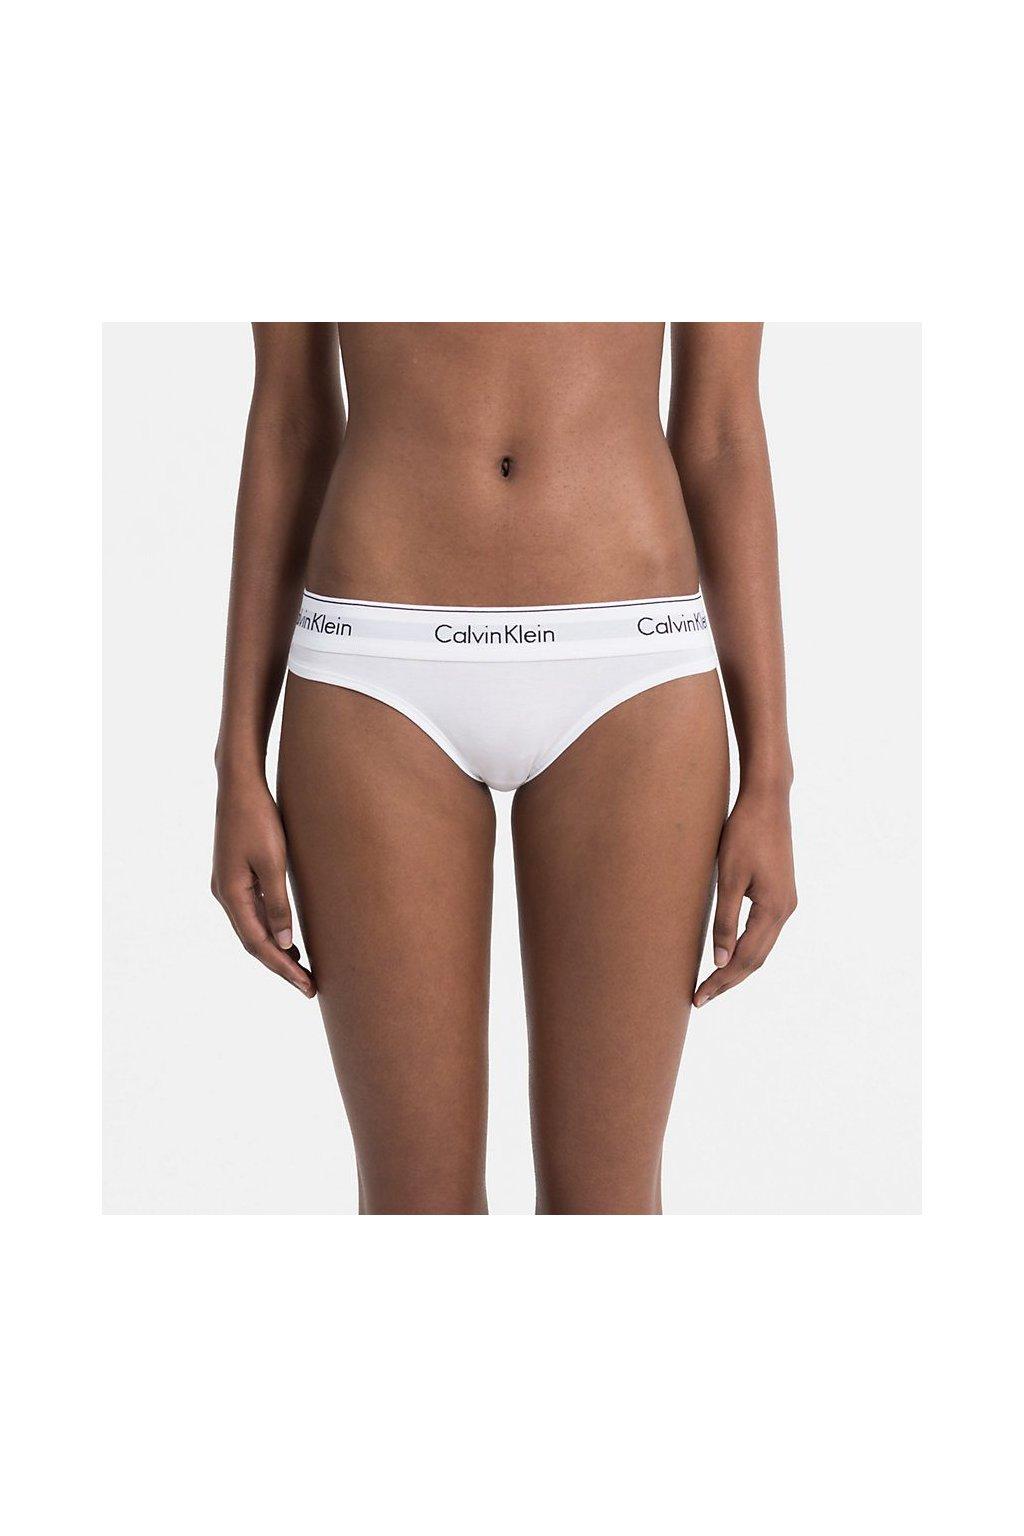 Calvin Klein Thong White